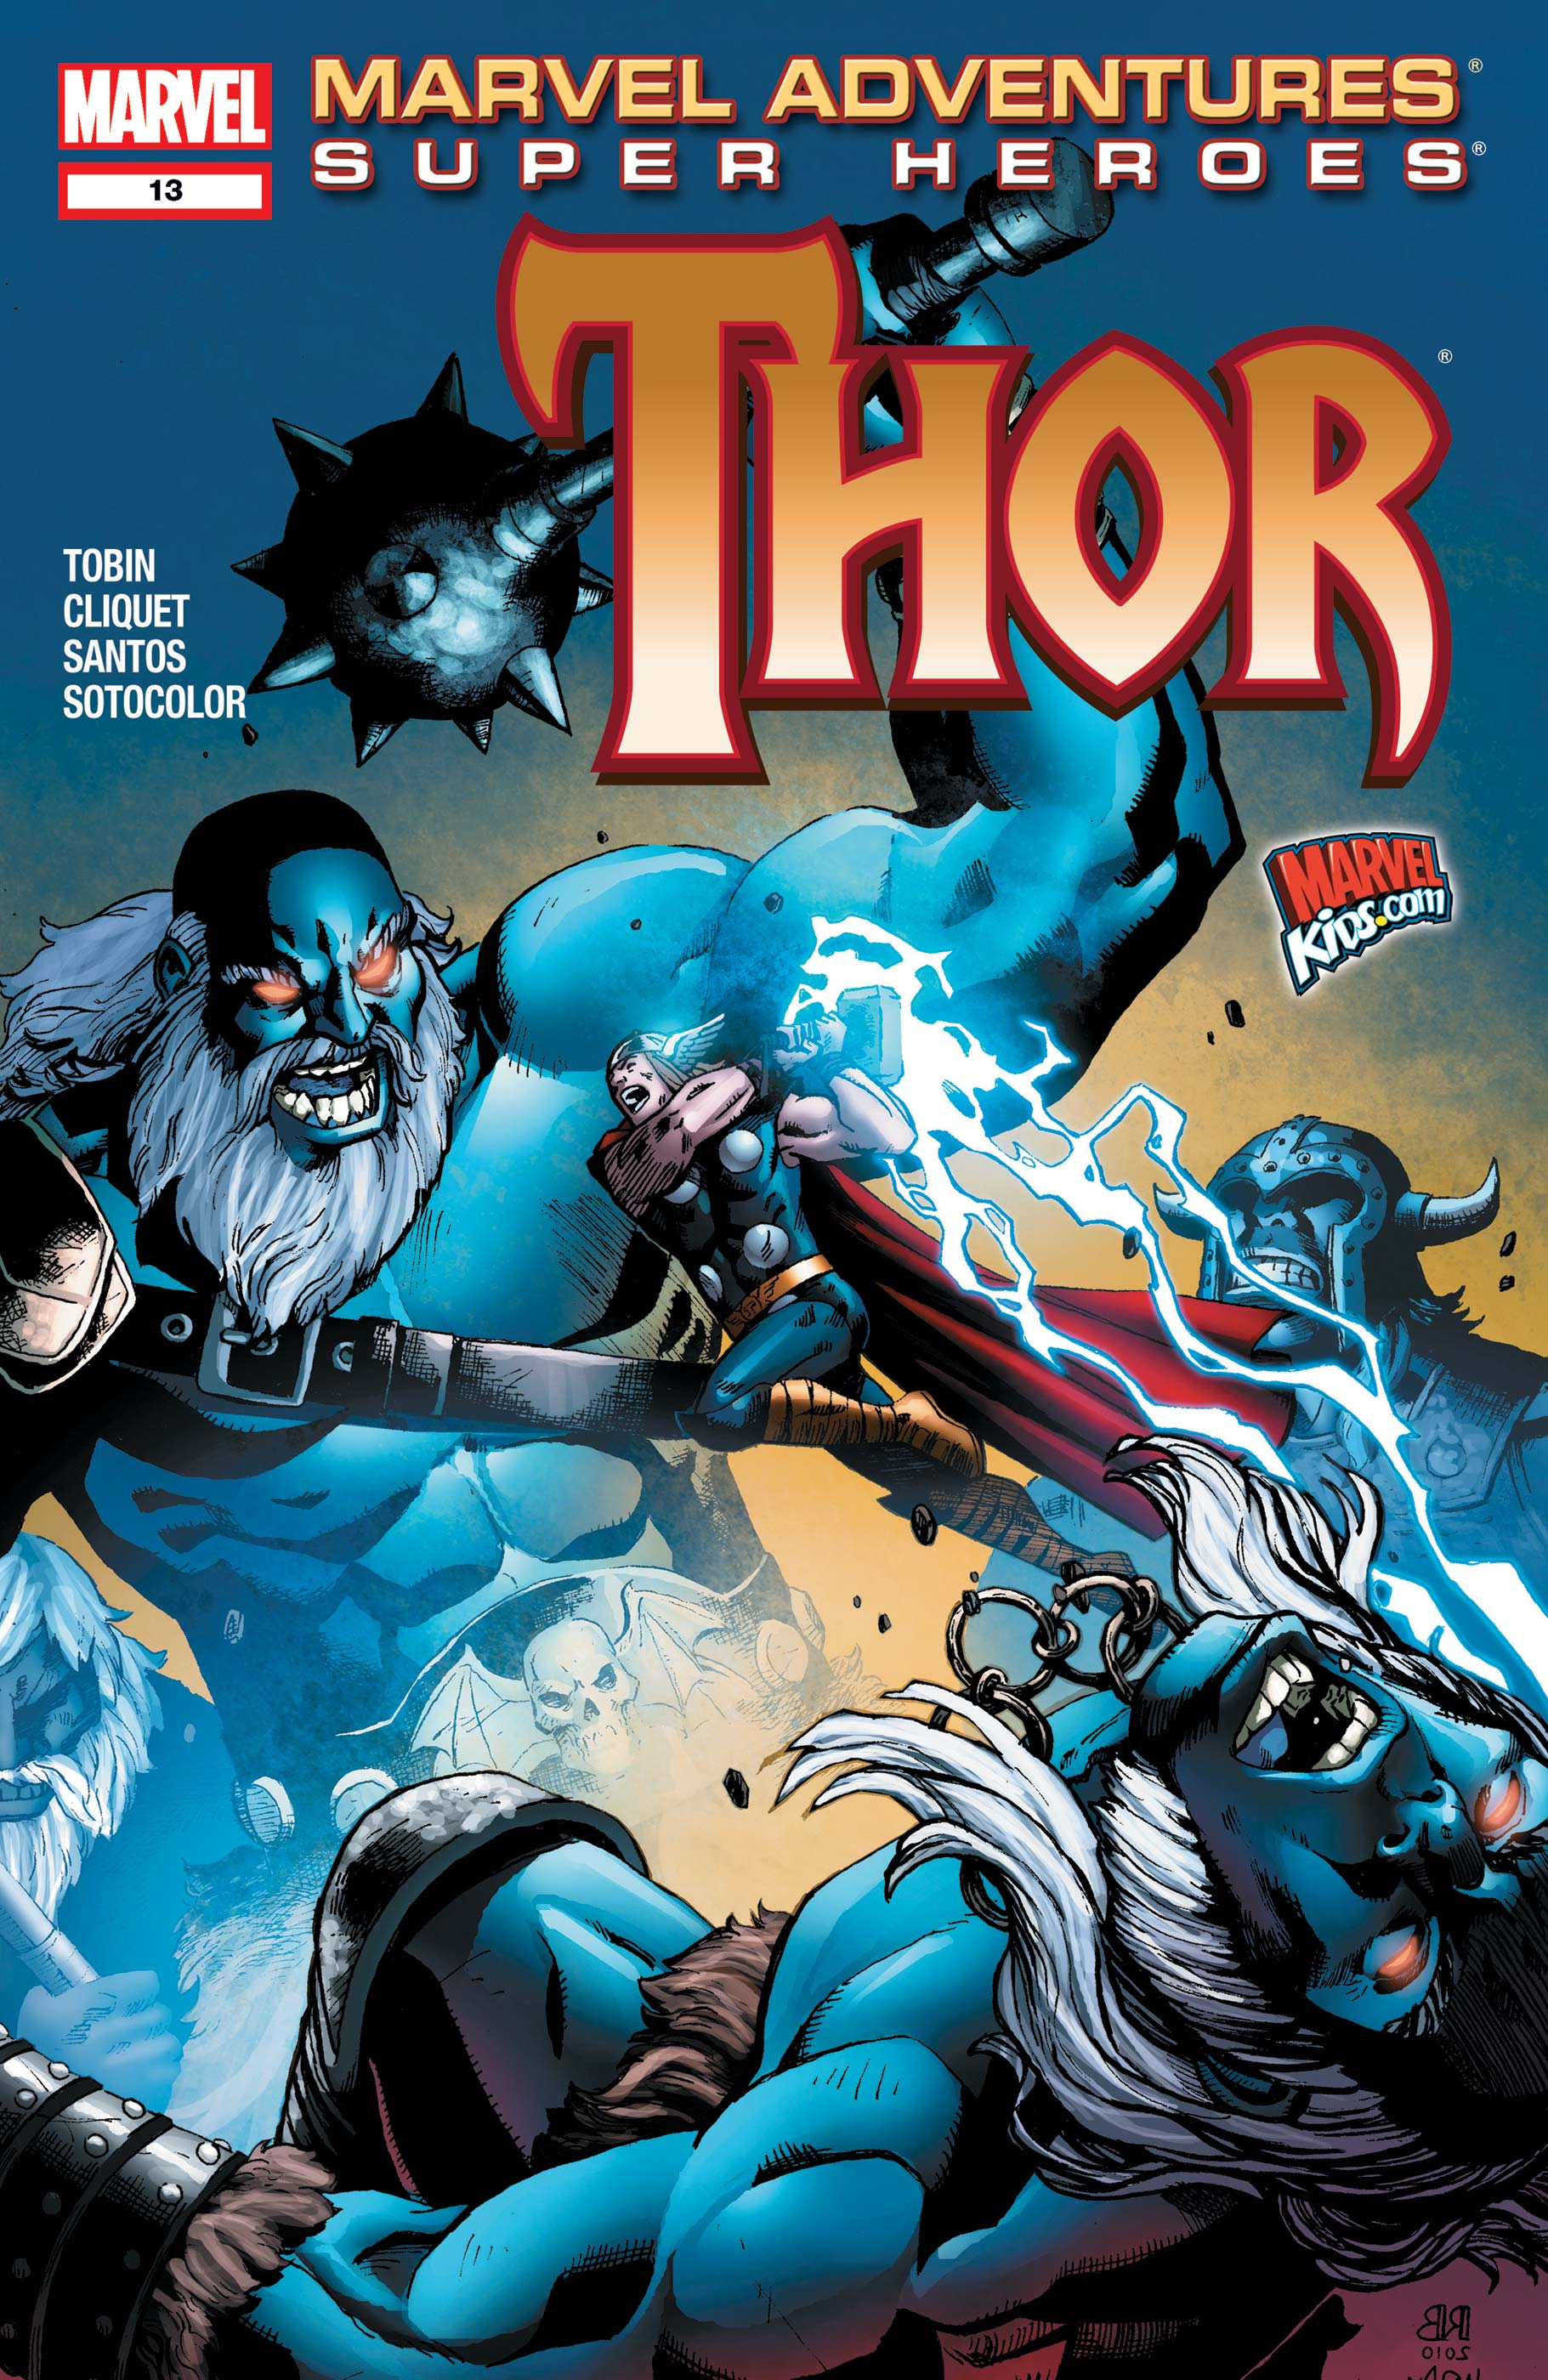 Marvel Adventures Super Heroes (2010) #13